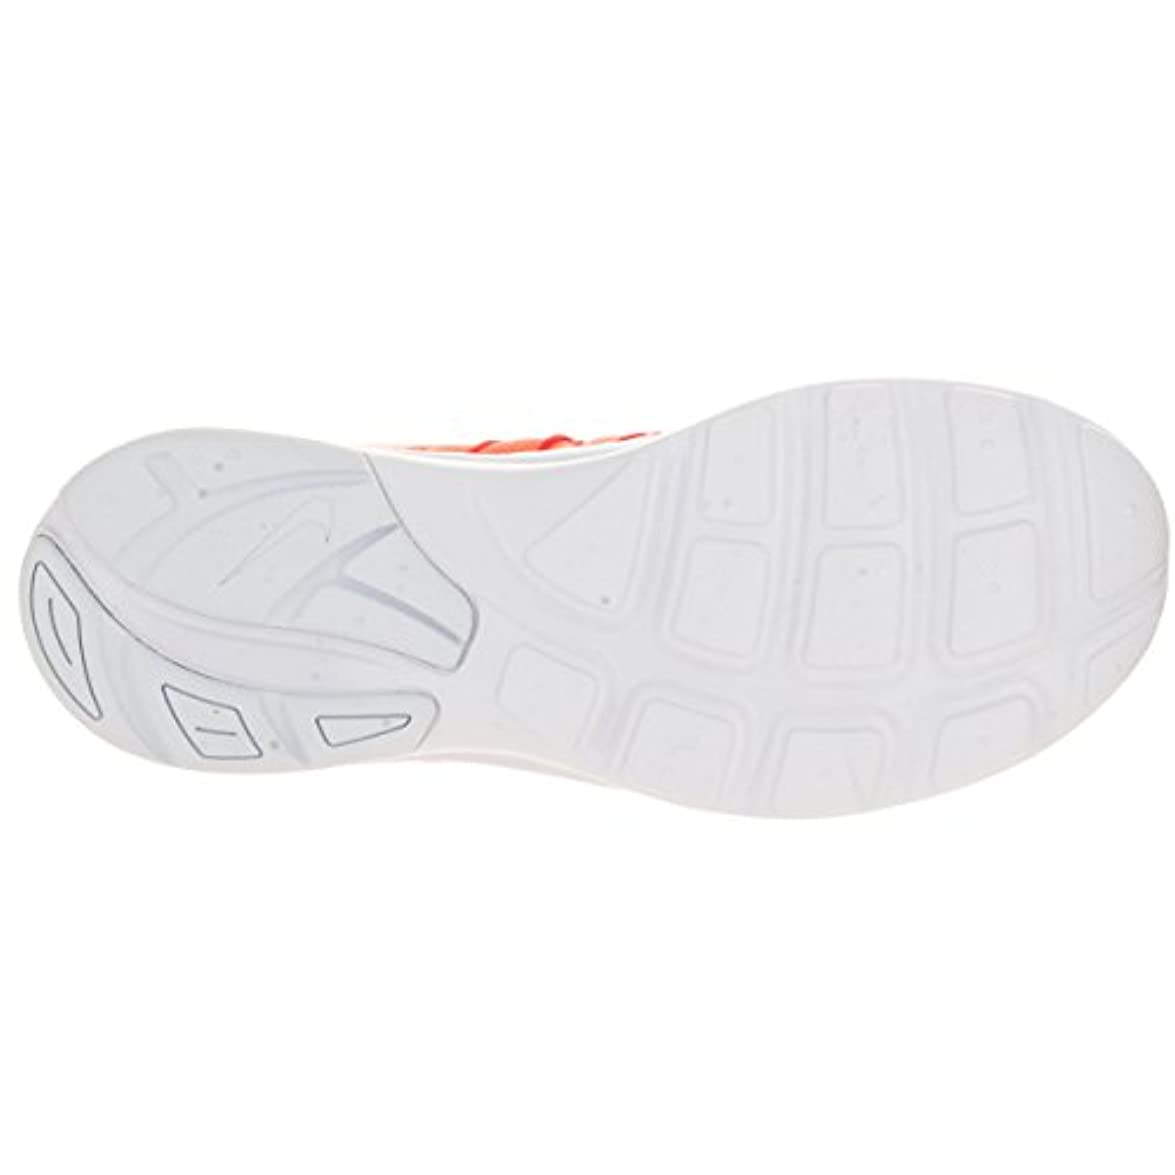 Darwin Donna Nike Sportive - Wmns Scarpe